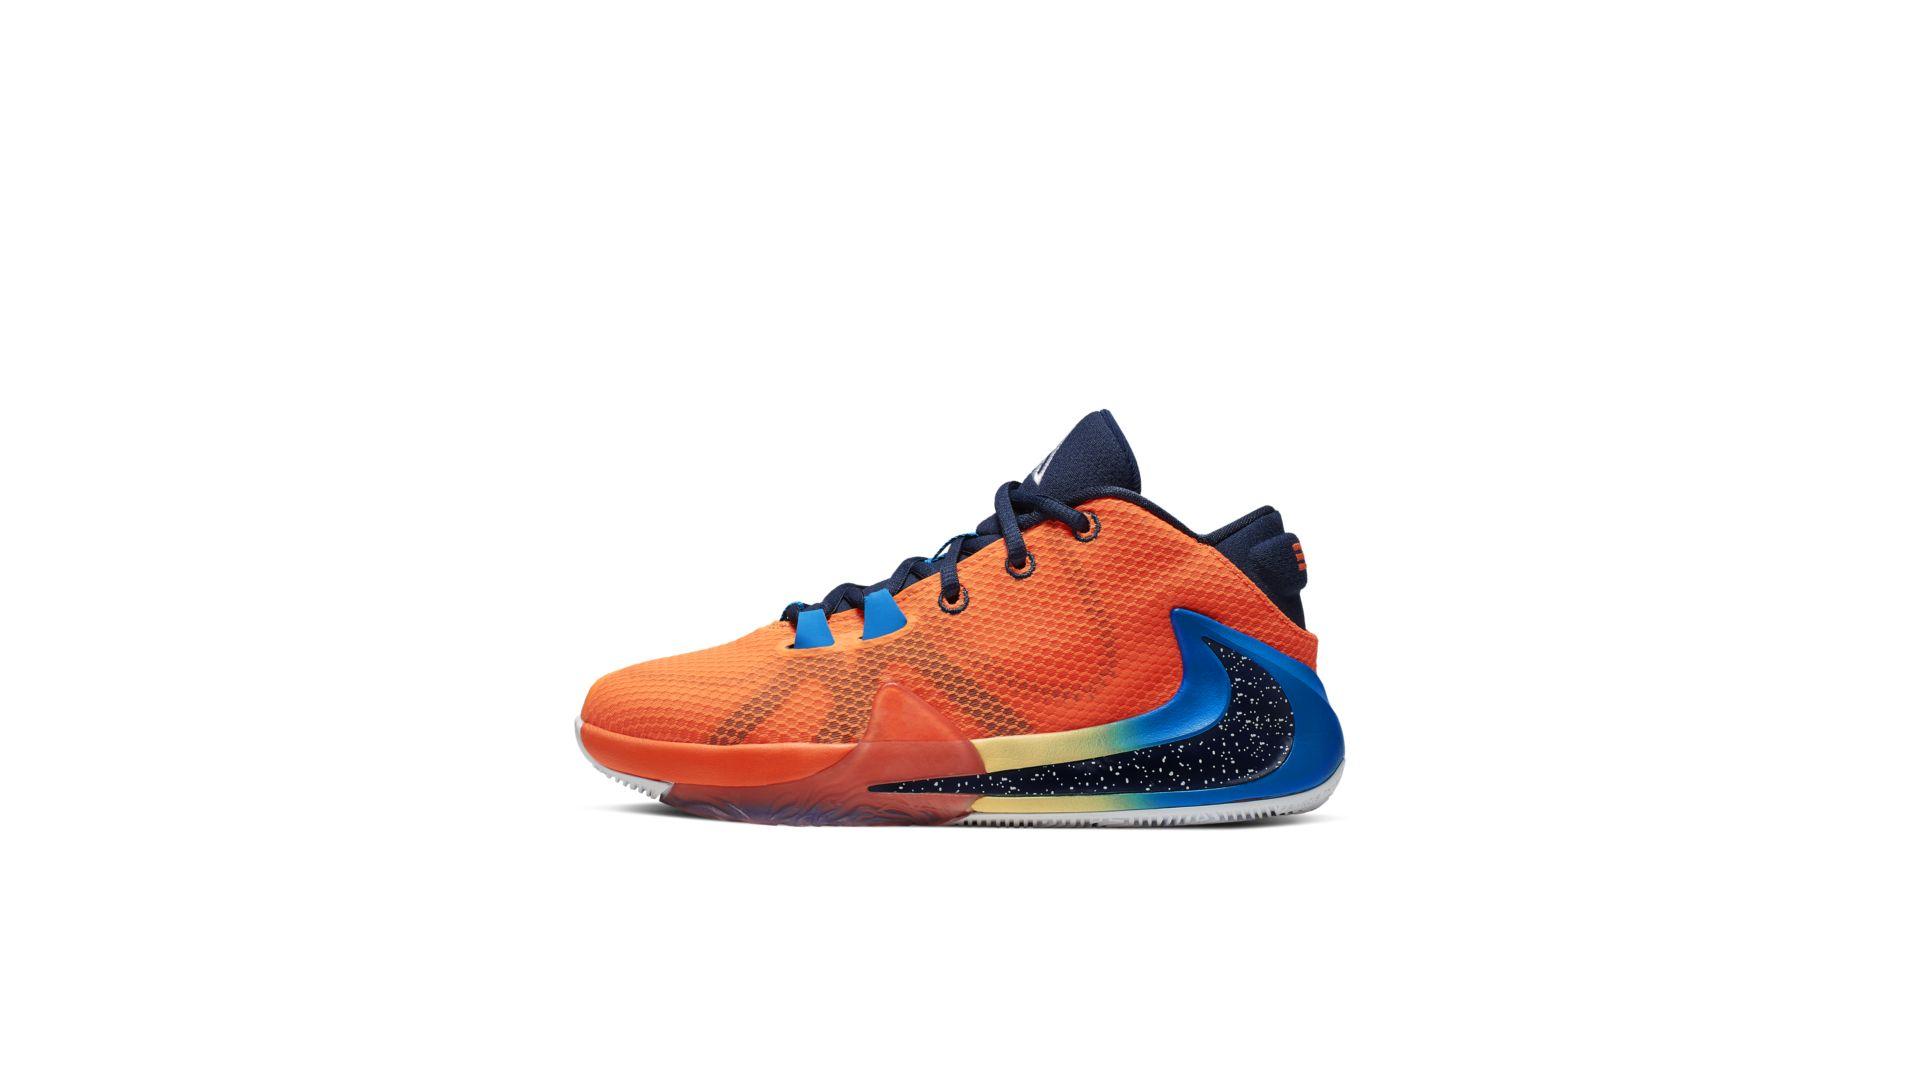 Nike Zoom Freak 1 Antetokounbros (GS) (BQ5633-800)